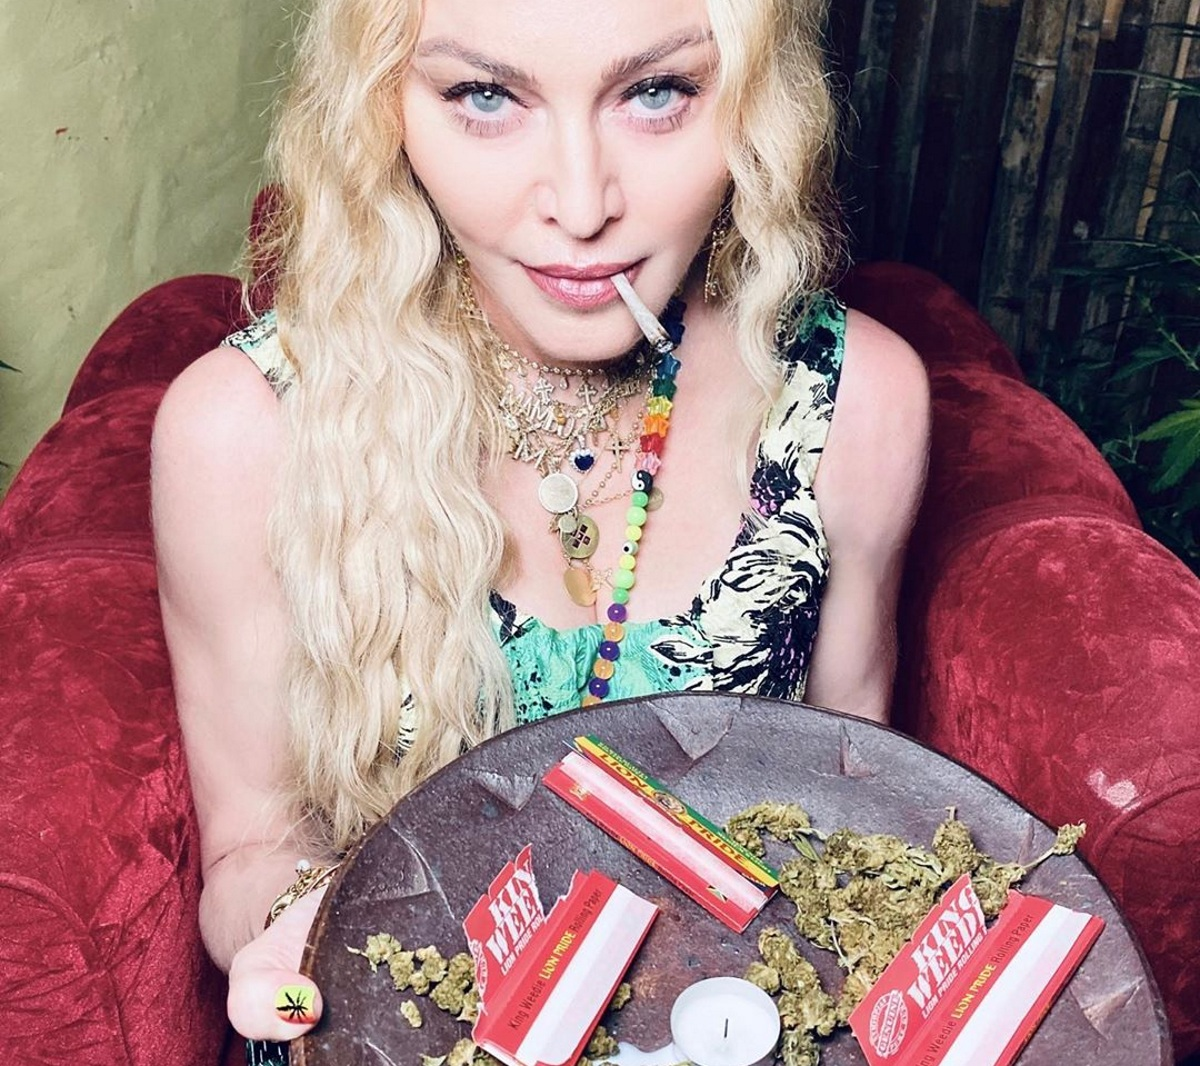 Madonna: Έγινε 62, μοιάζει 42 και έκανε ξέφρενο πάρτι στη Τζαμάικα με τον αγαπημένο και την κόρη της! [pics,vid]